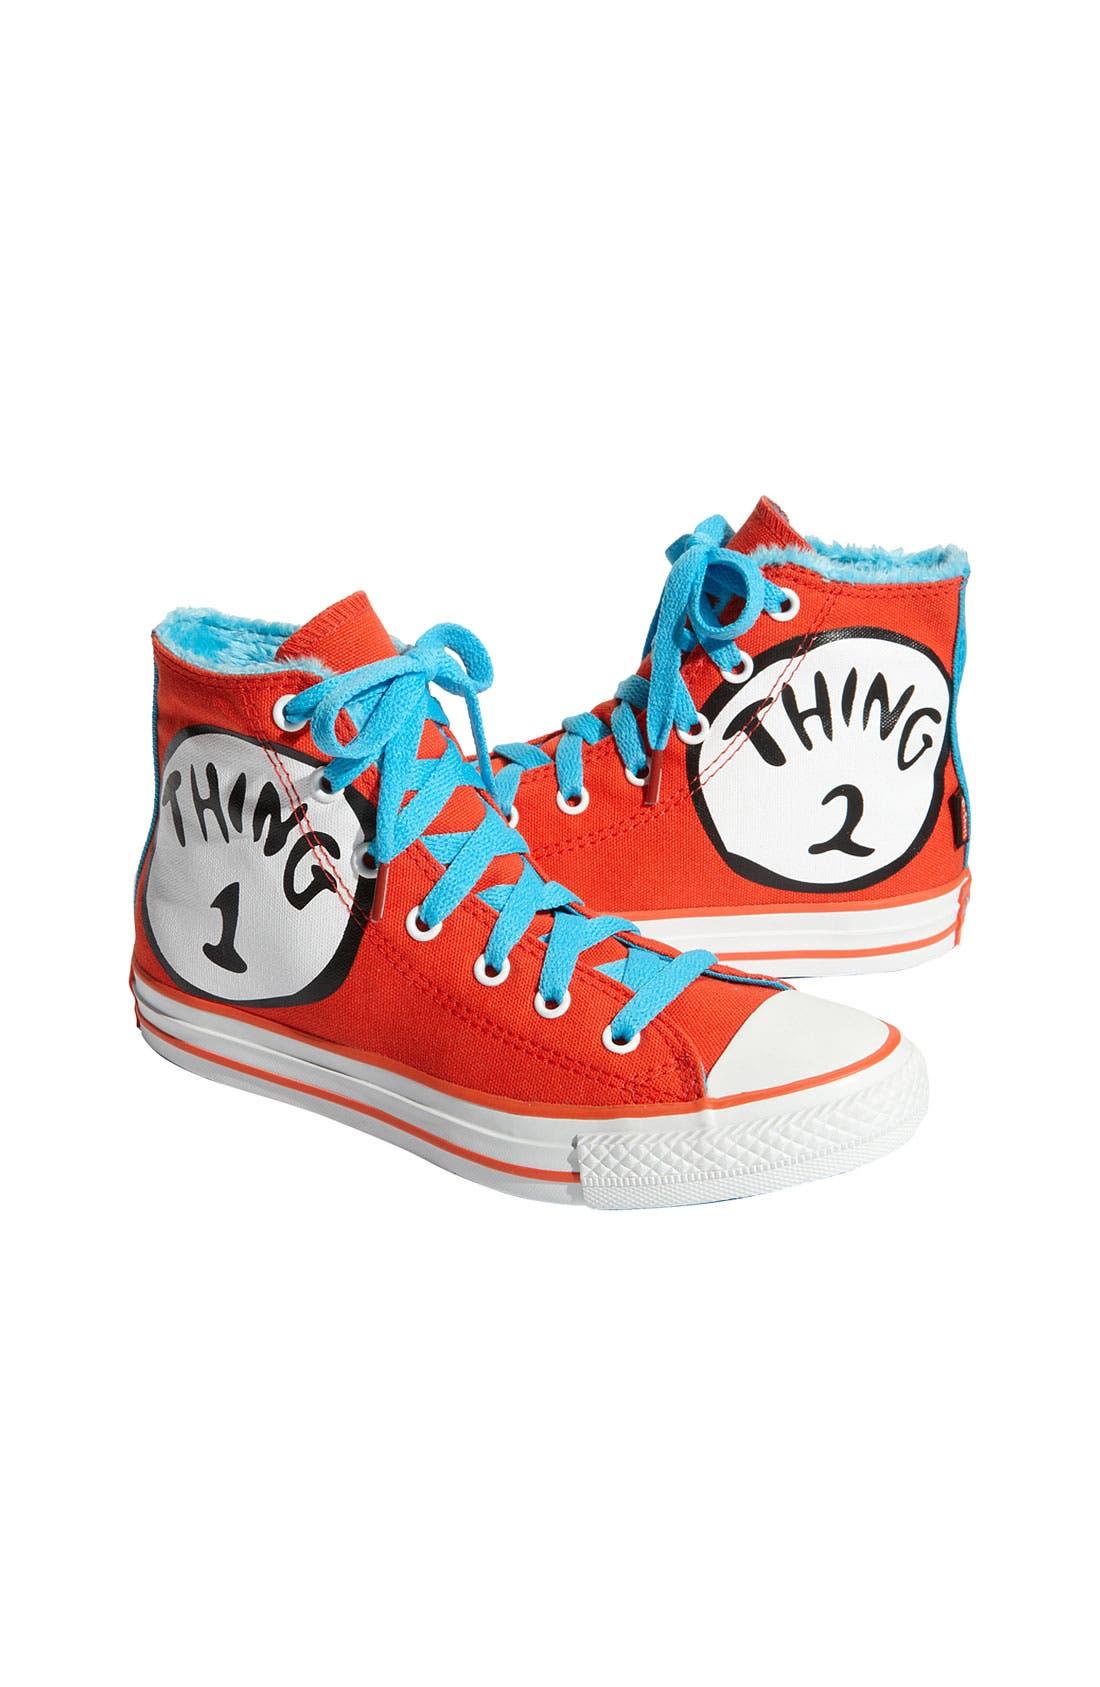 Chuck Taylor<sup>®</sup> 'Dr. Seuss - Thing 1 & Thing 2' Sneaker,                             Main thumbnail 1, color,                             618